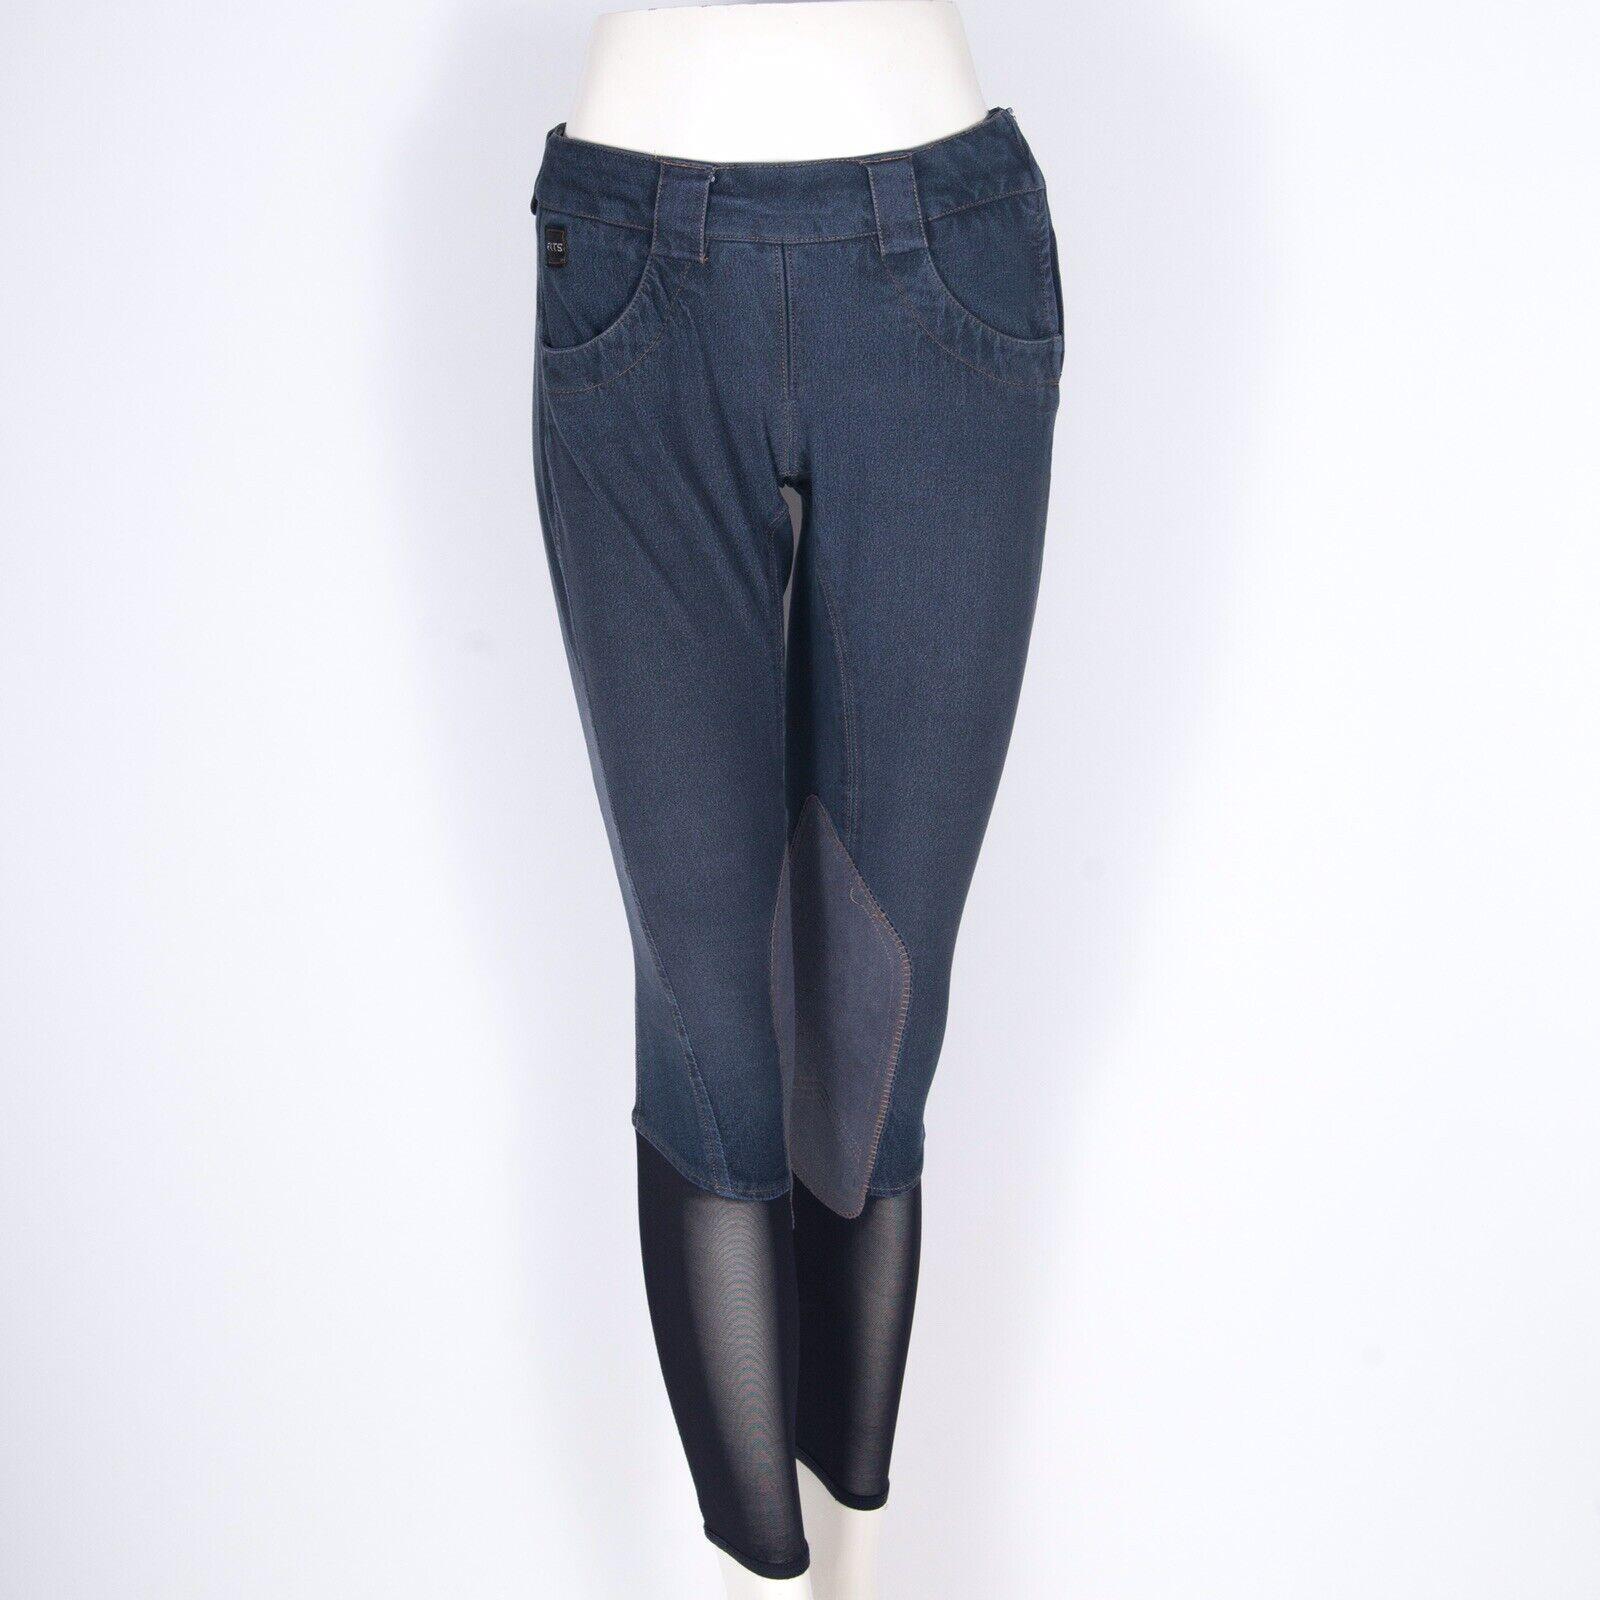 FITS Denim Riding Breeches Equestrian Pants blu XS